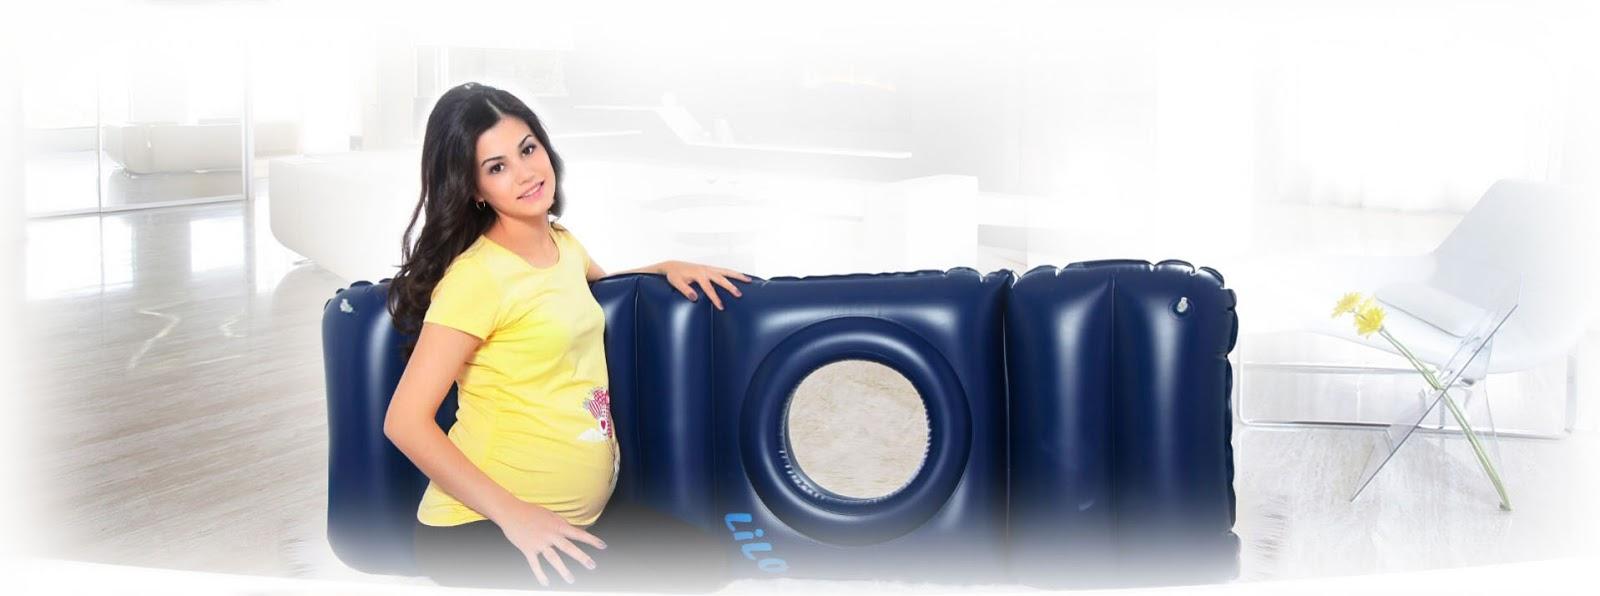 Матрасы для беременных с дыркой для живота цена 60